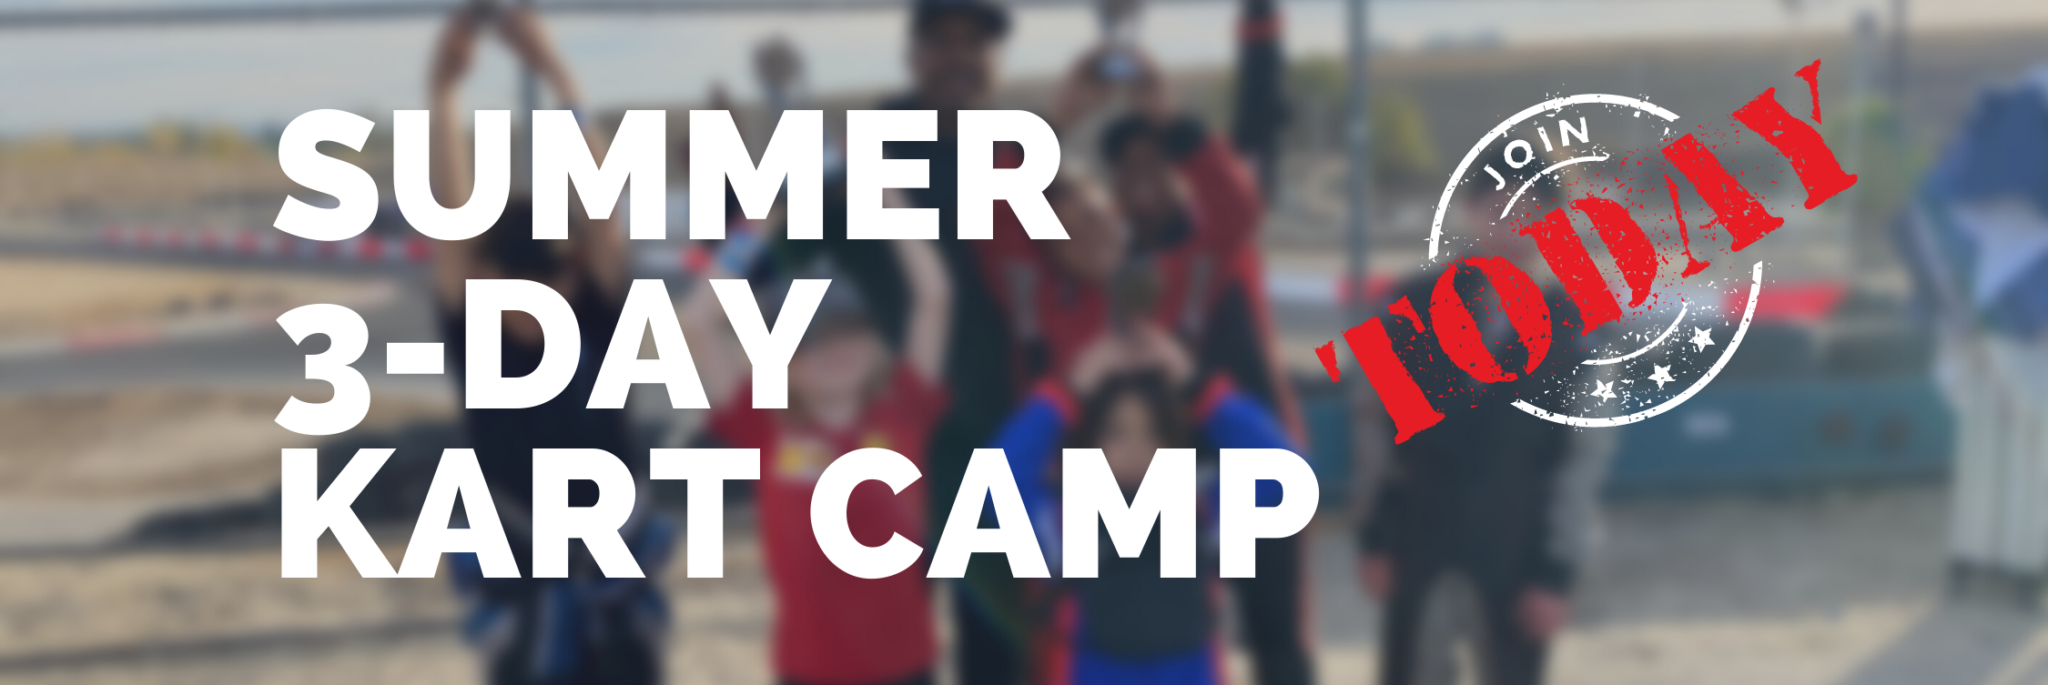 Summer 4 Day Kart Camp Web Banner (1)